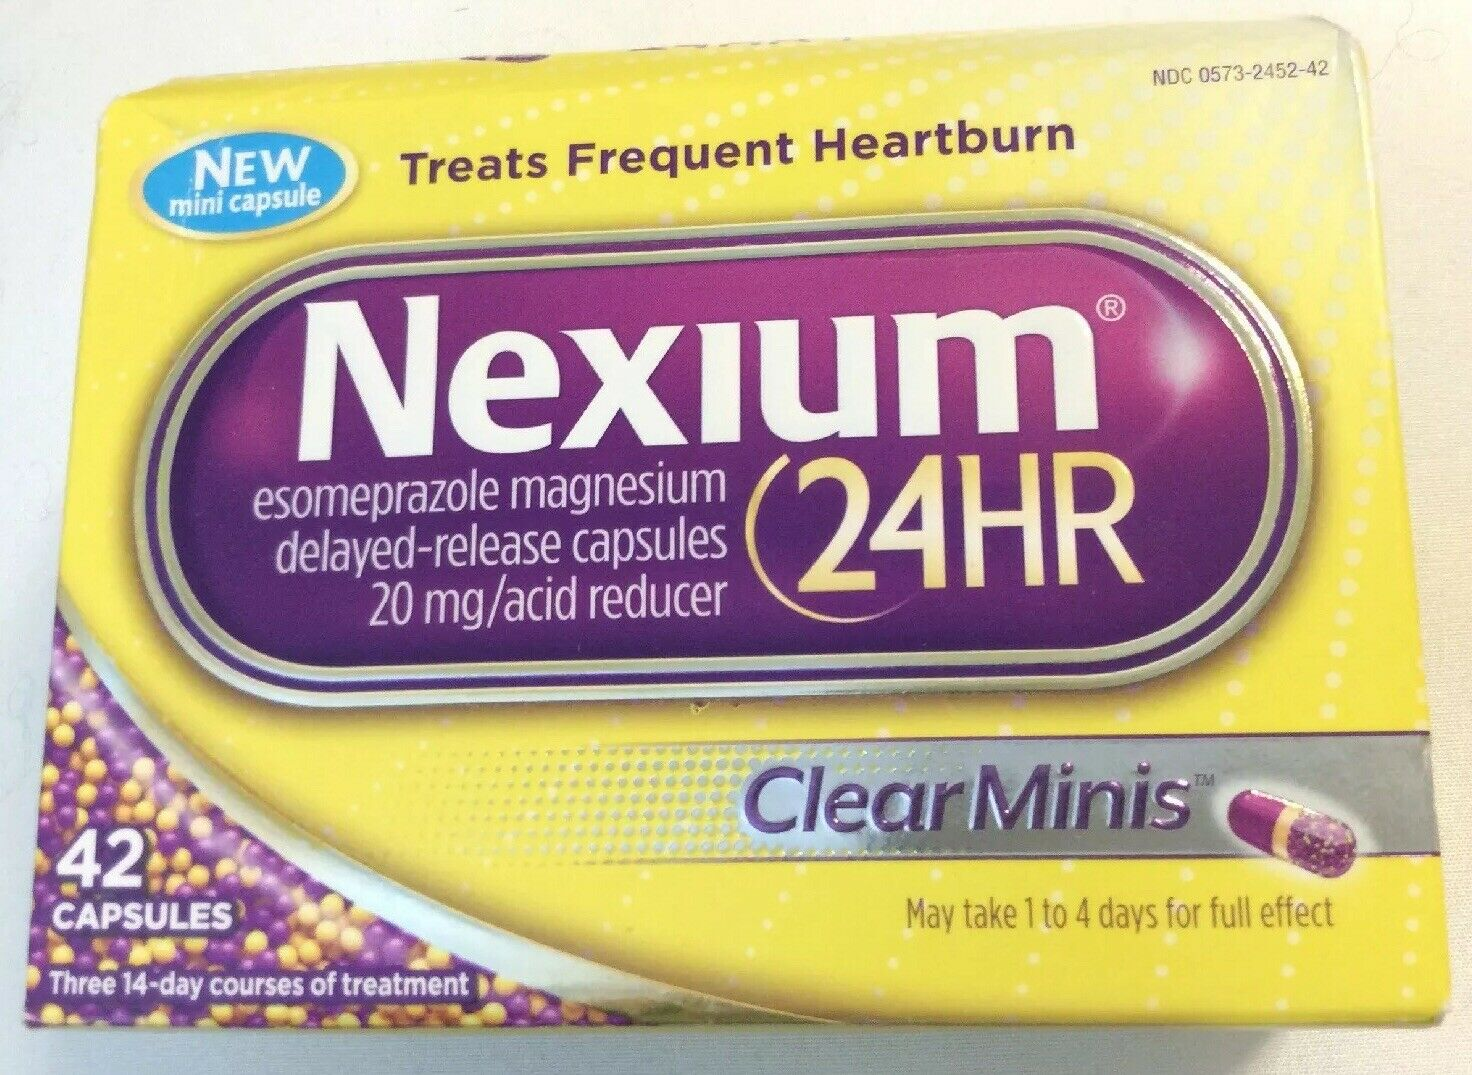 Nexium 24HR Clear Minis 42 Capsules Treats Frequent Heartburn Exp:9/2022 Or Bett 4